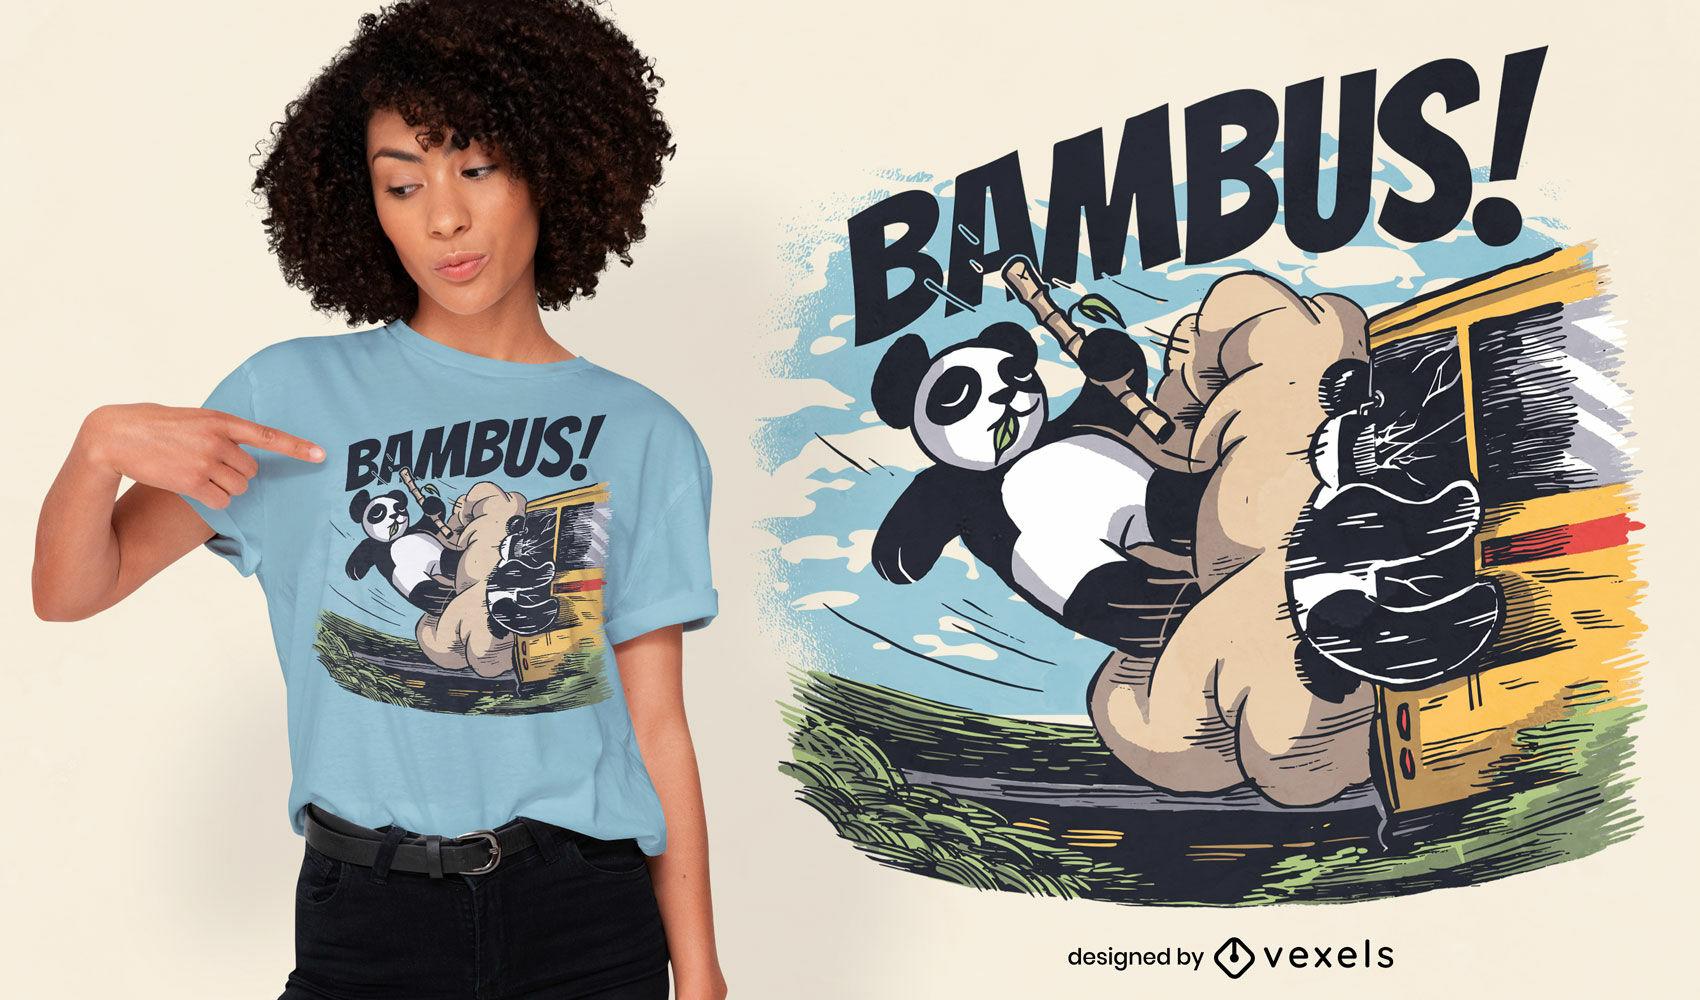 Panda bear bus crash t-shirt design